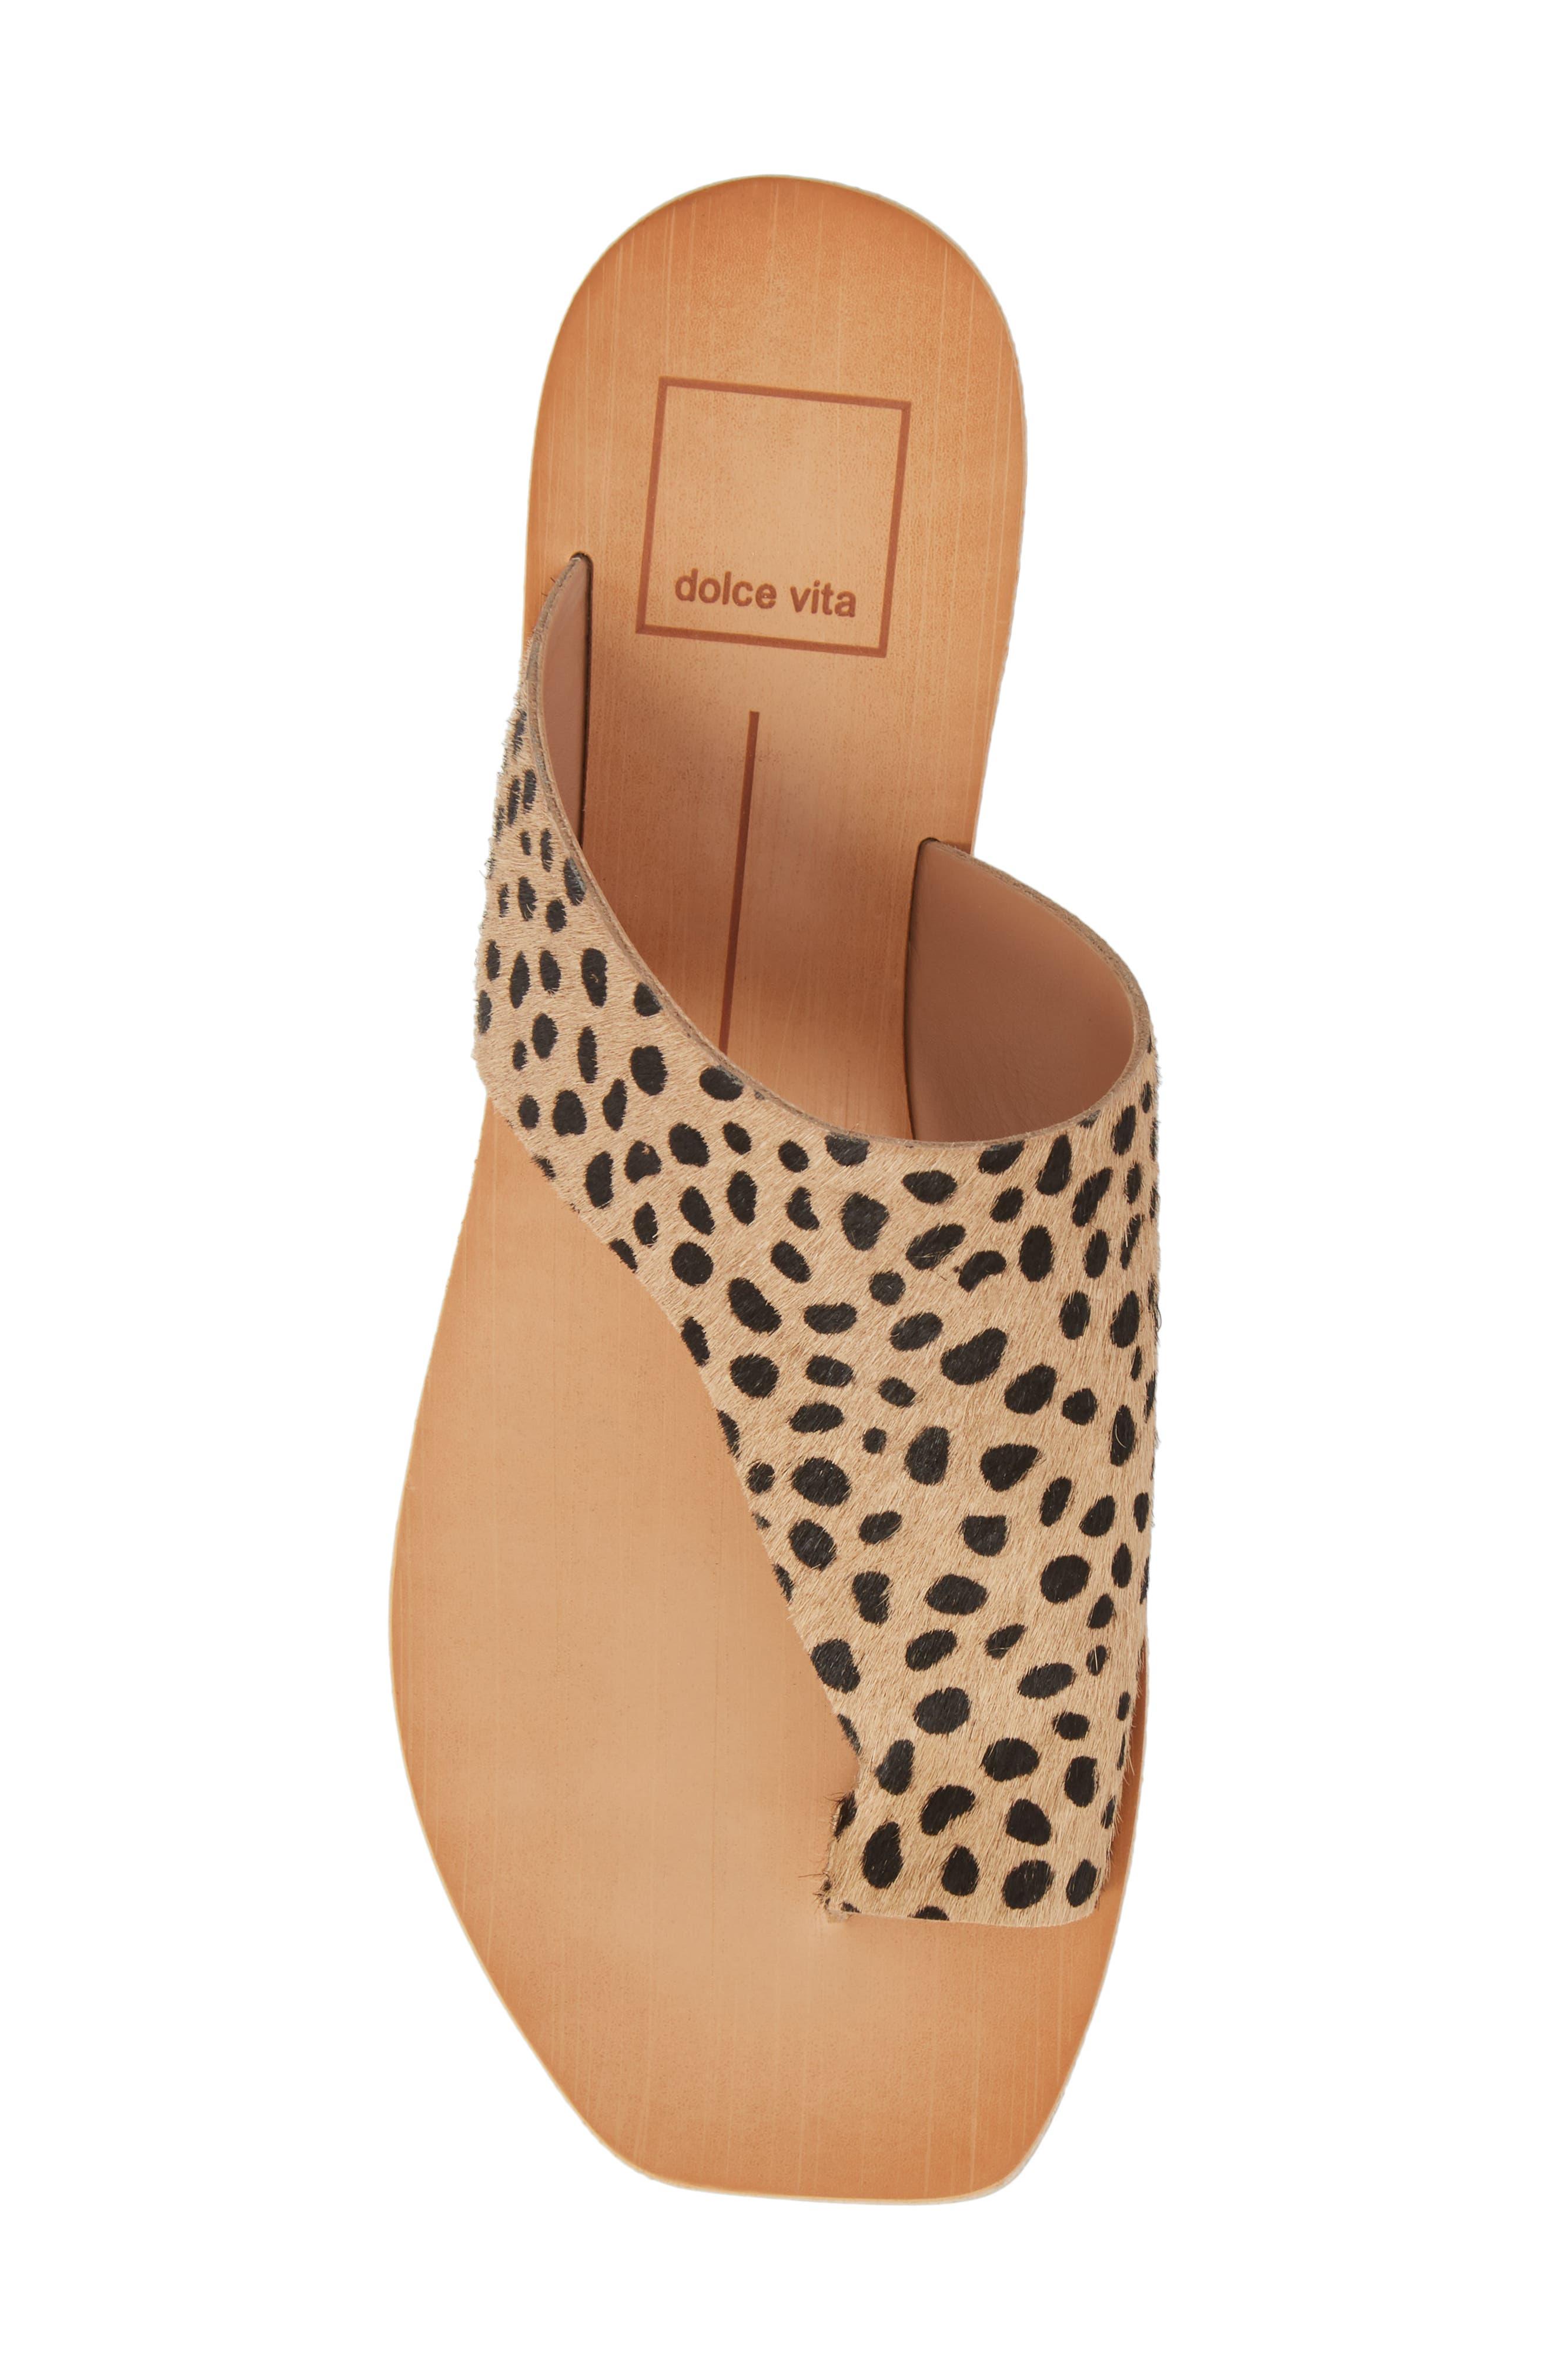 Hazle Asymmetrical Toe Loop Sandal,                             Alternate thumbnail 15, color,